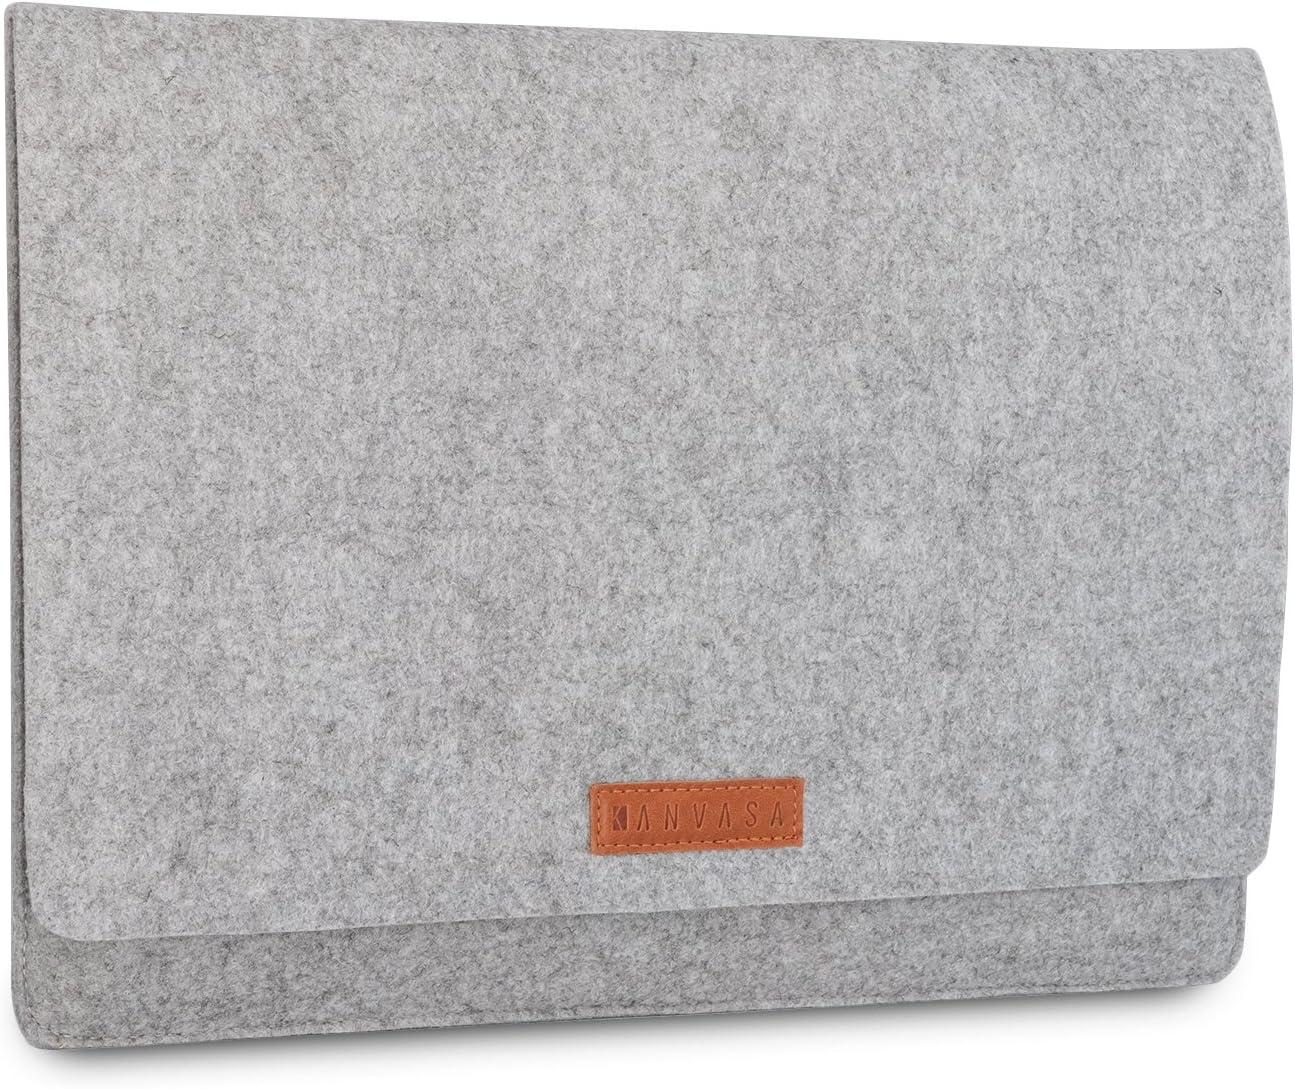 KANVASA Felt Laptop Sleeve 14-15 Inch MacBook Pro Grey Notebook Case